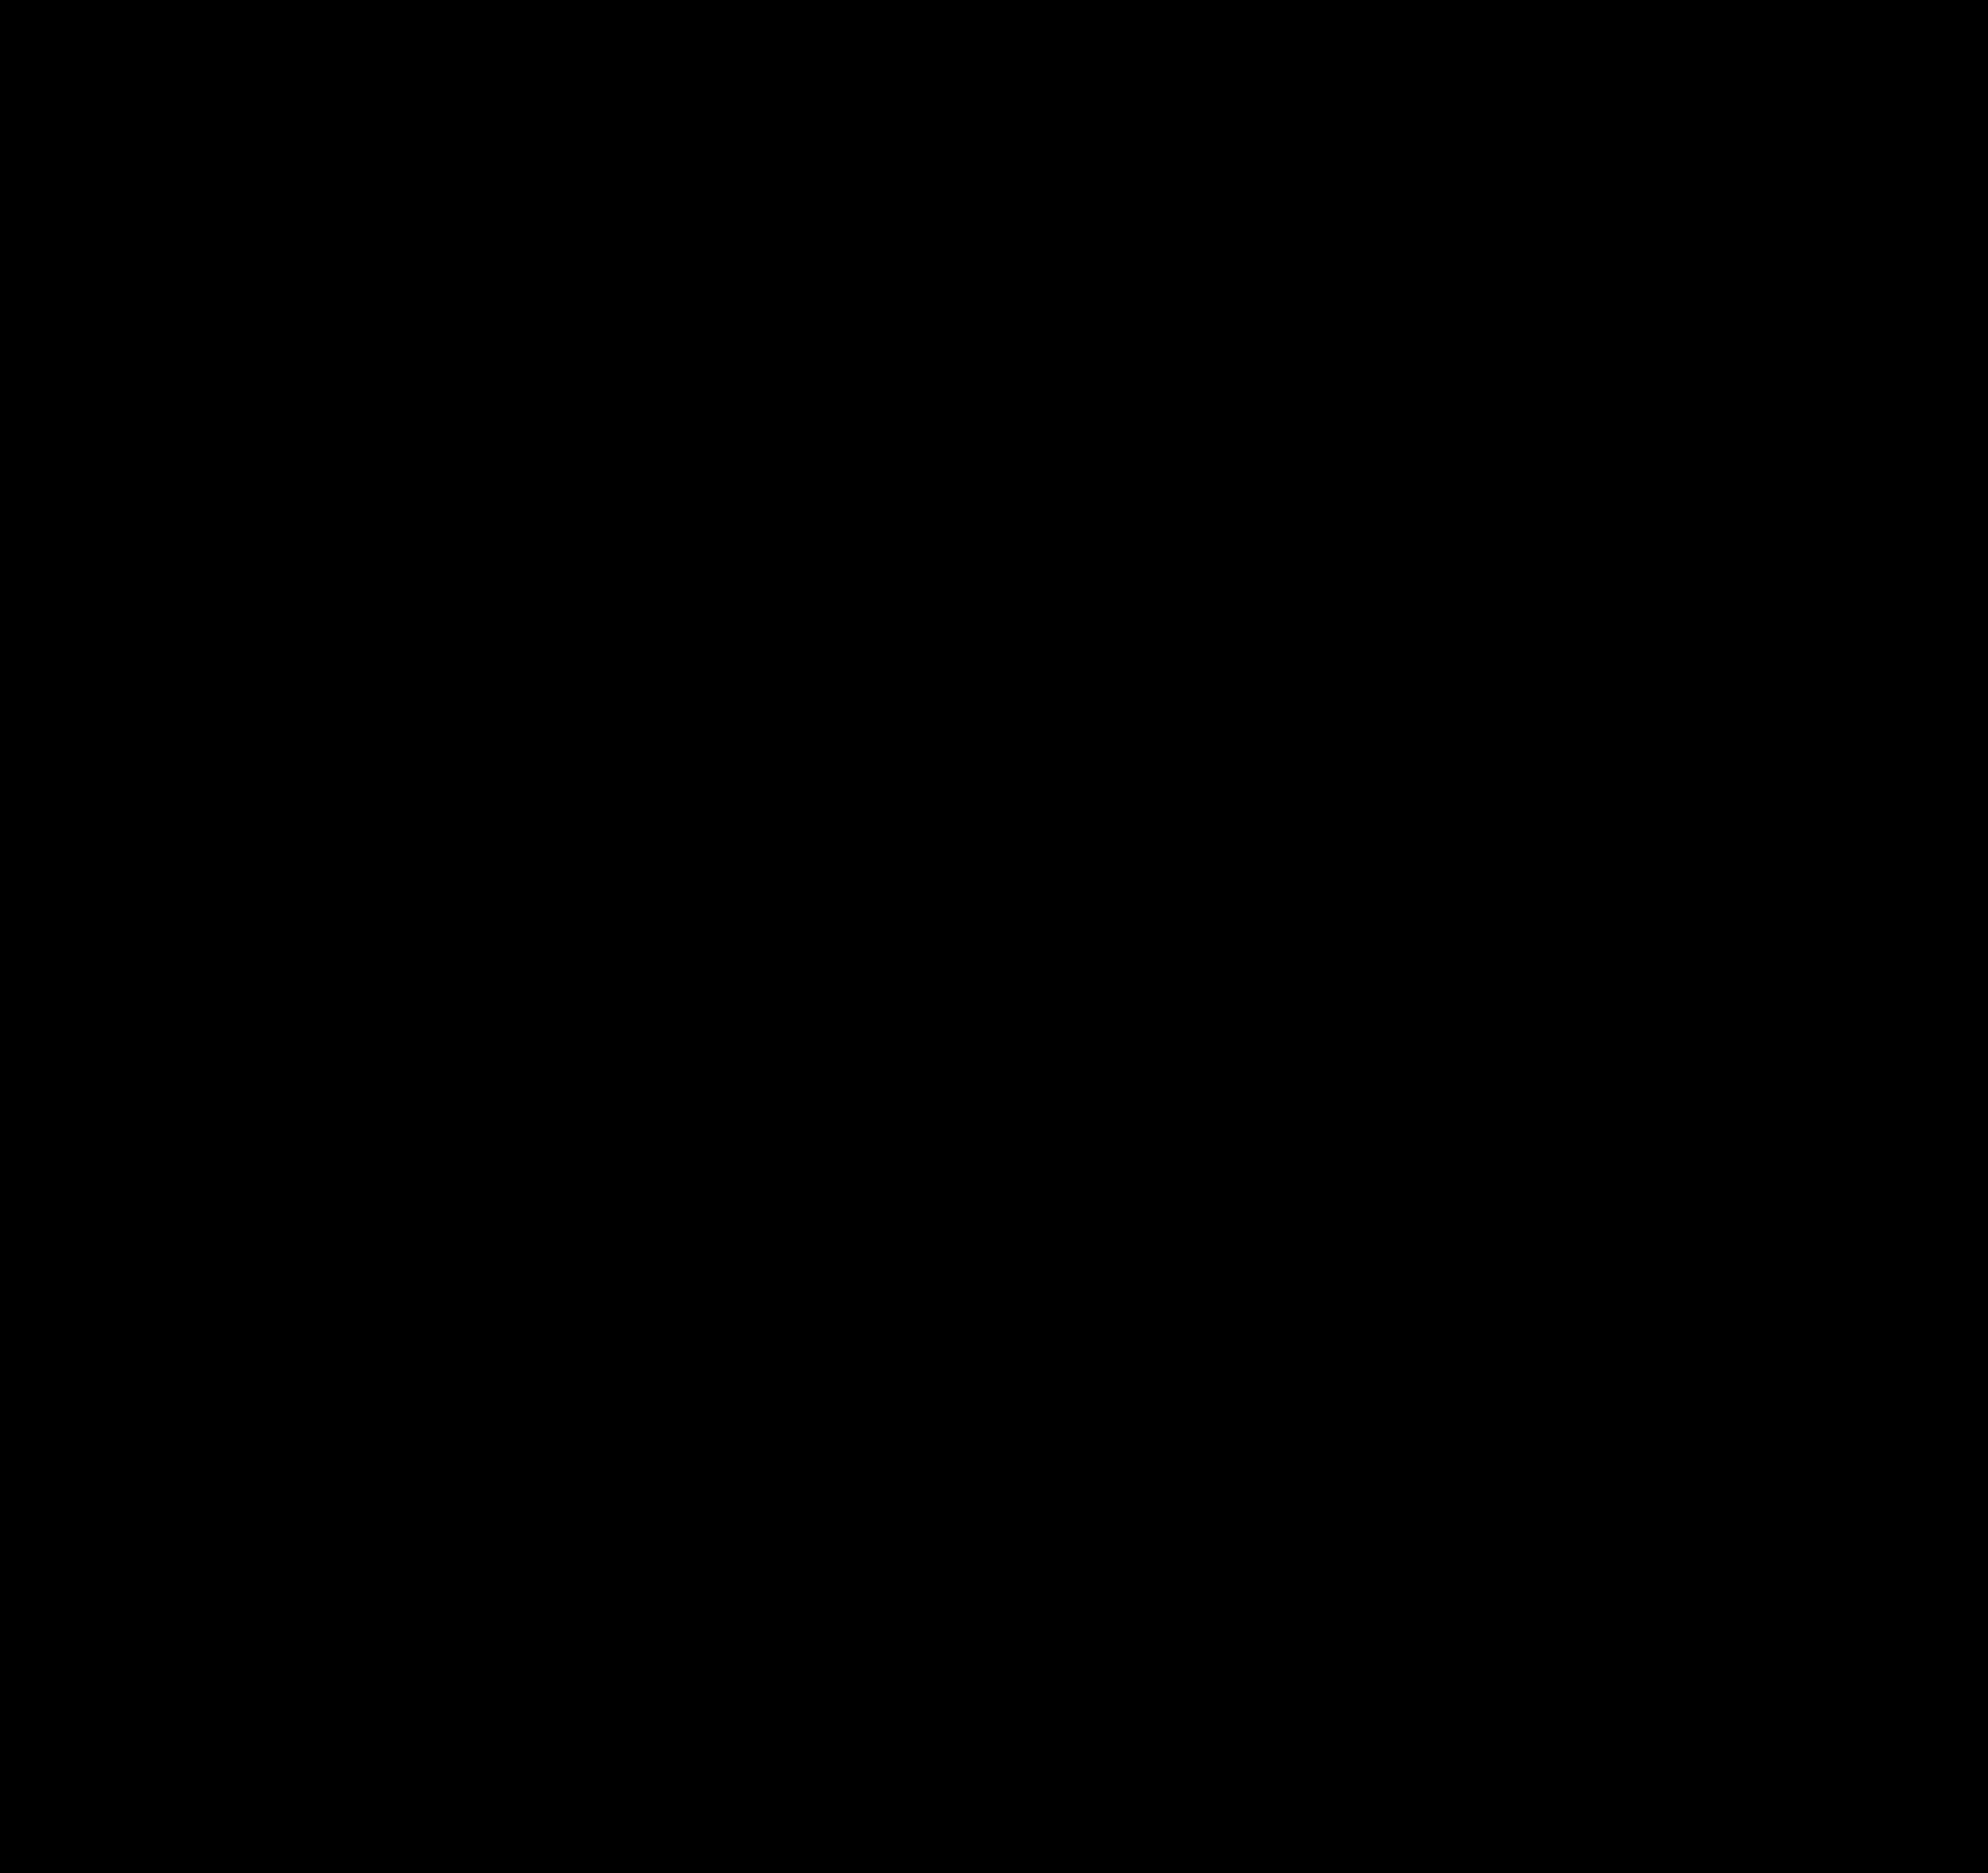 logo-black(14).png